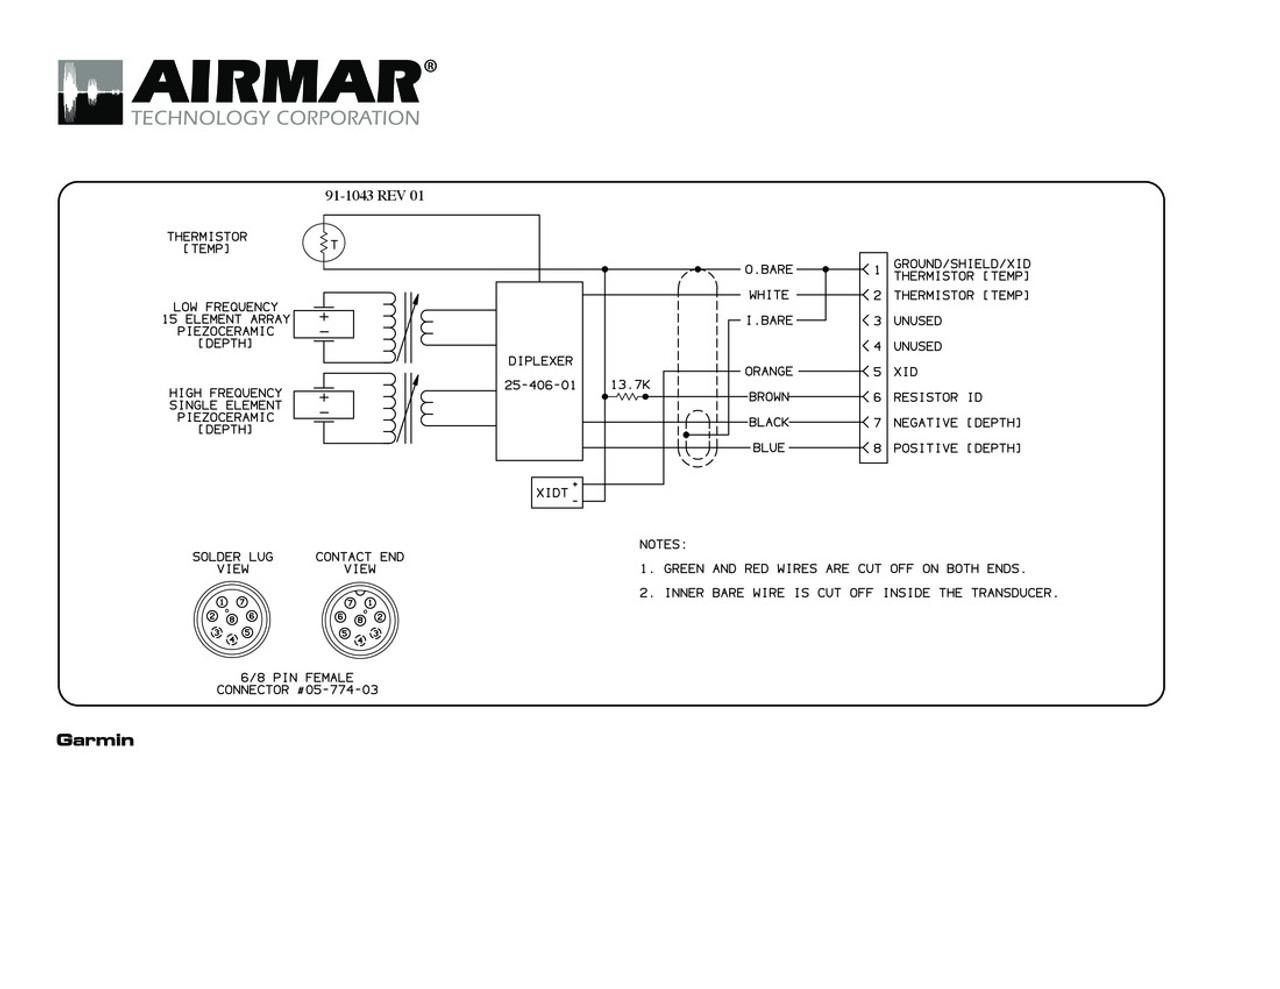 hight resolution of airmar wiring diagram garmin r99 8 pin d t blue bottle marine garmin 8 pin wiring diagram